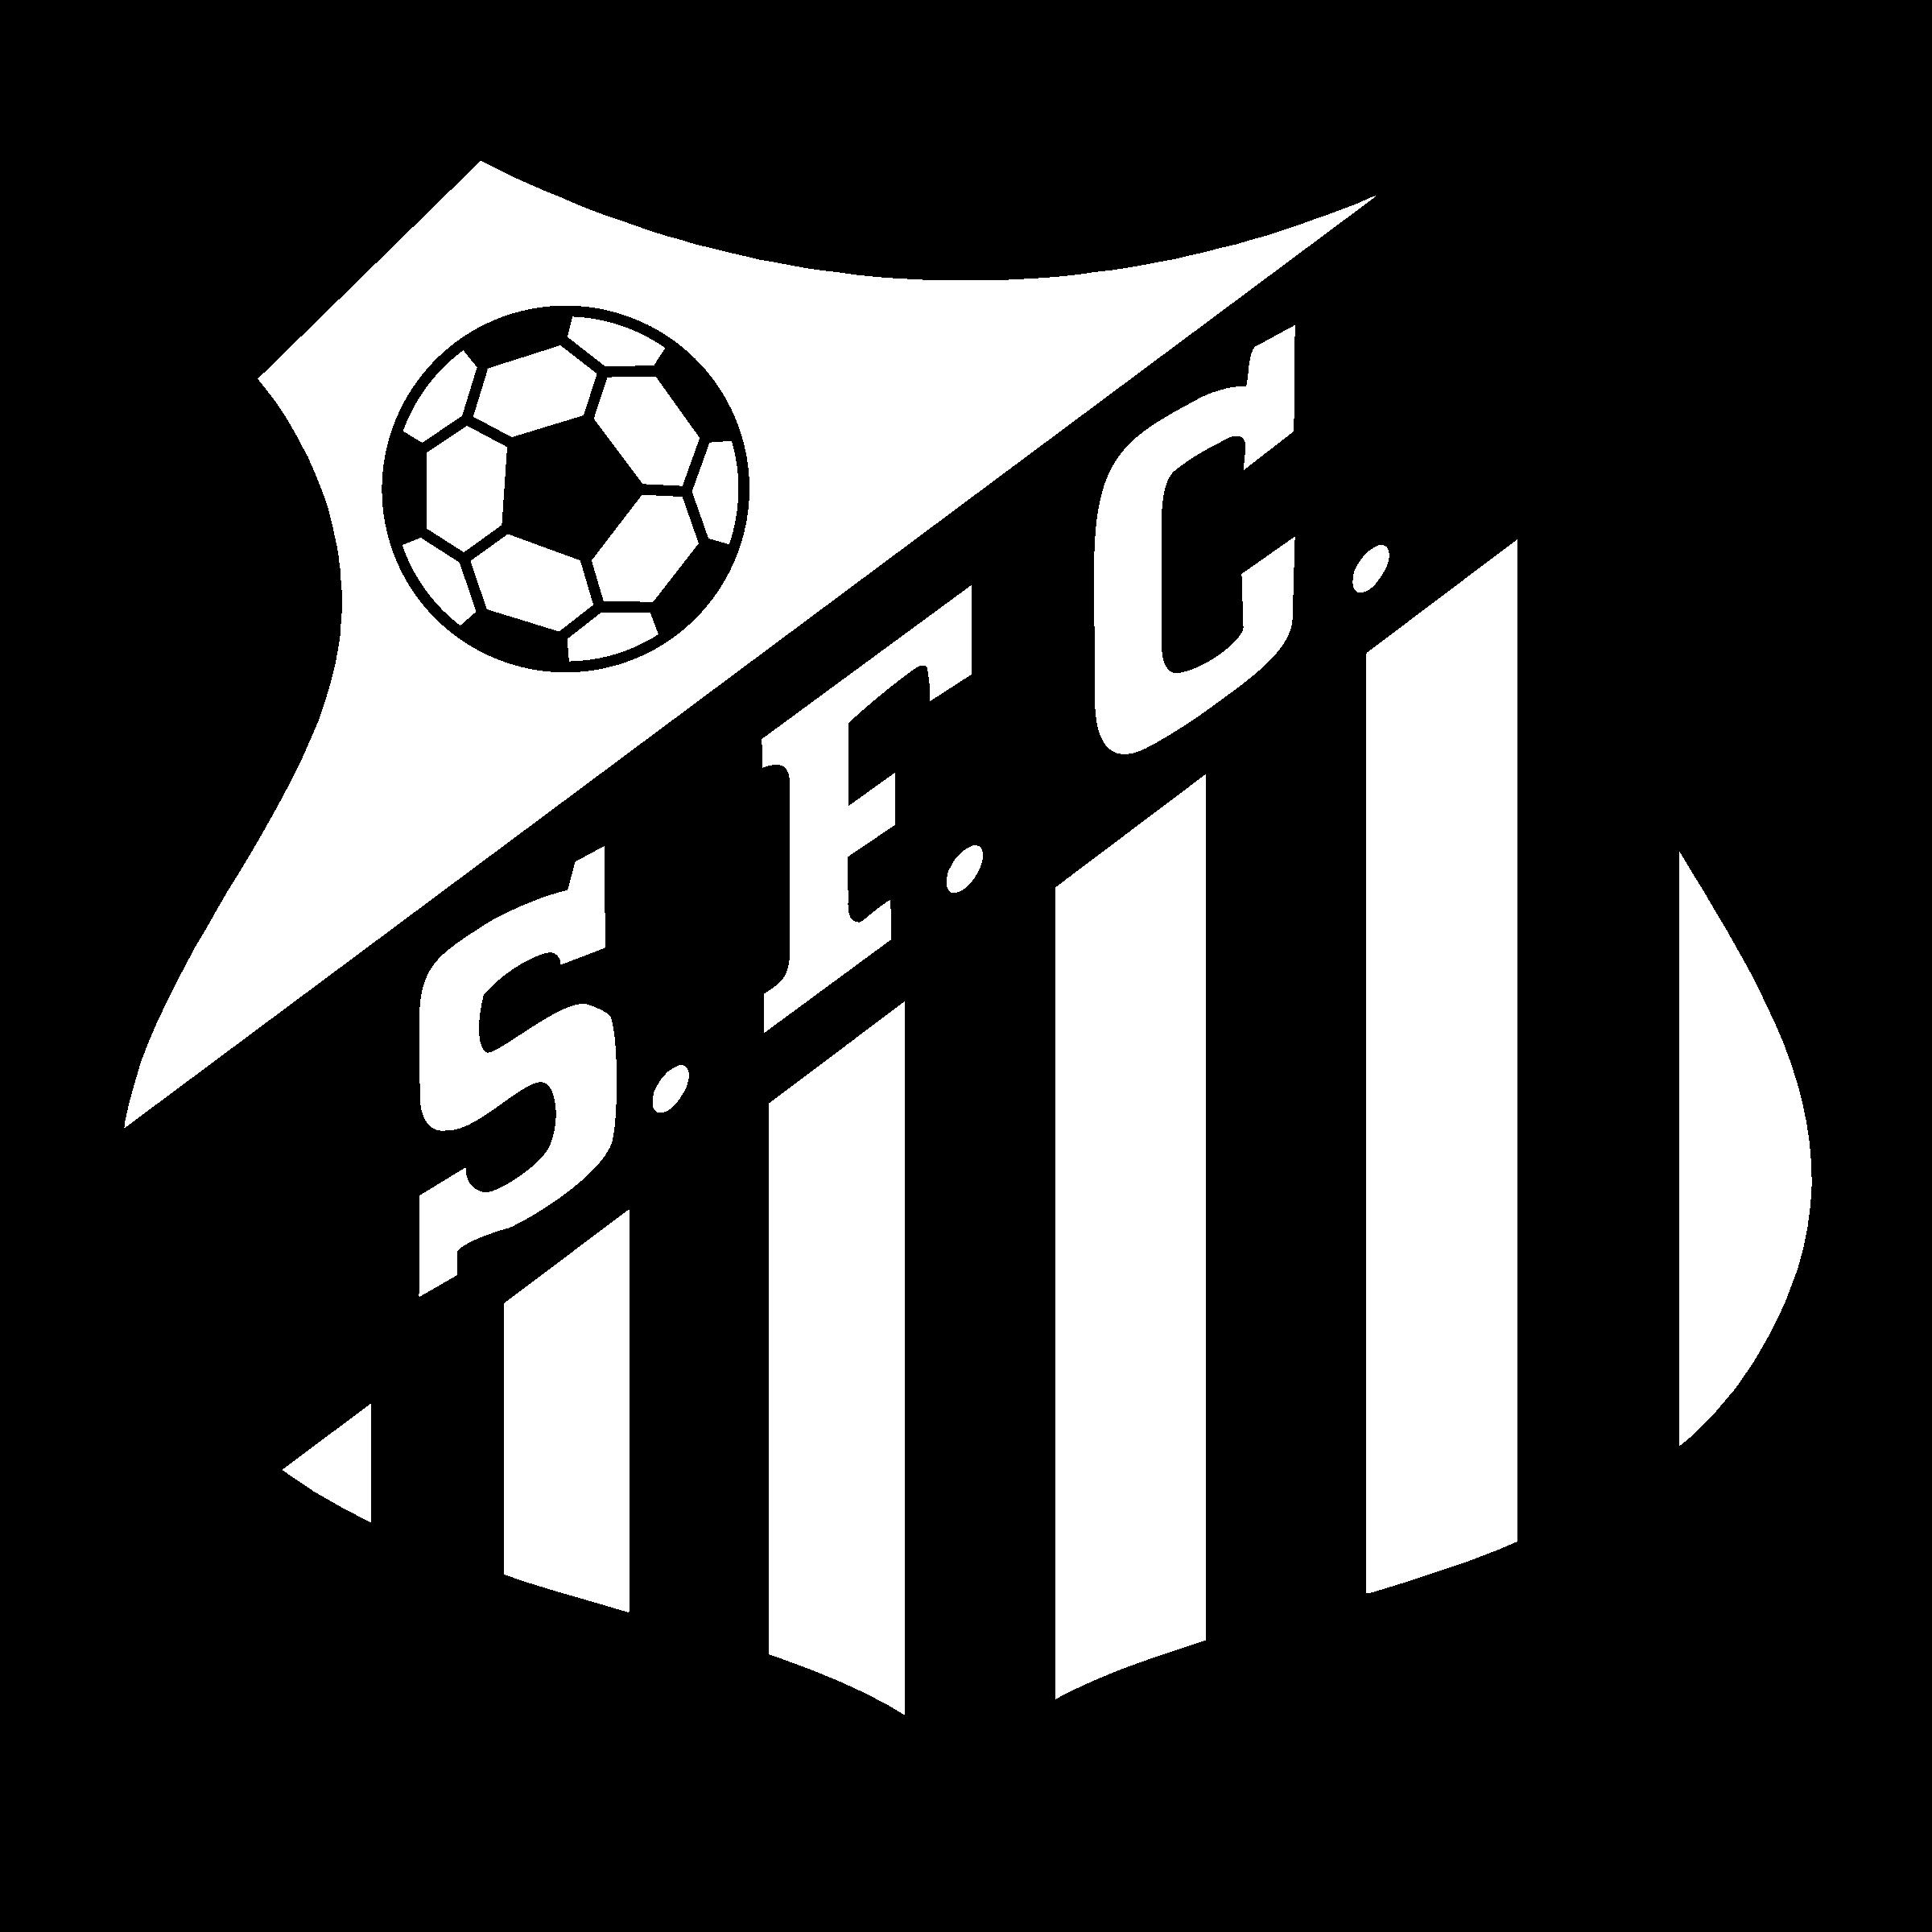 Santos FC Logo PNG Transparent & SVG Vector - Freebie Supply